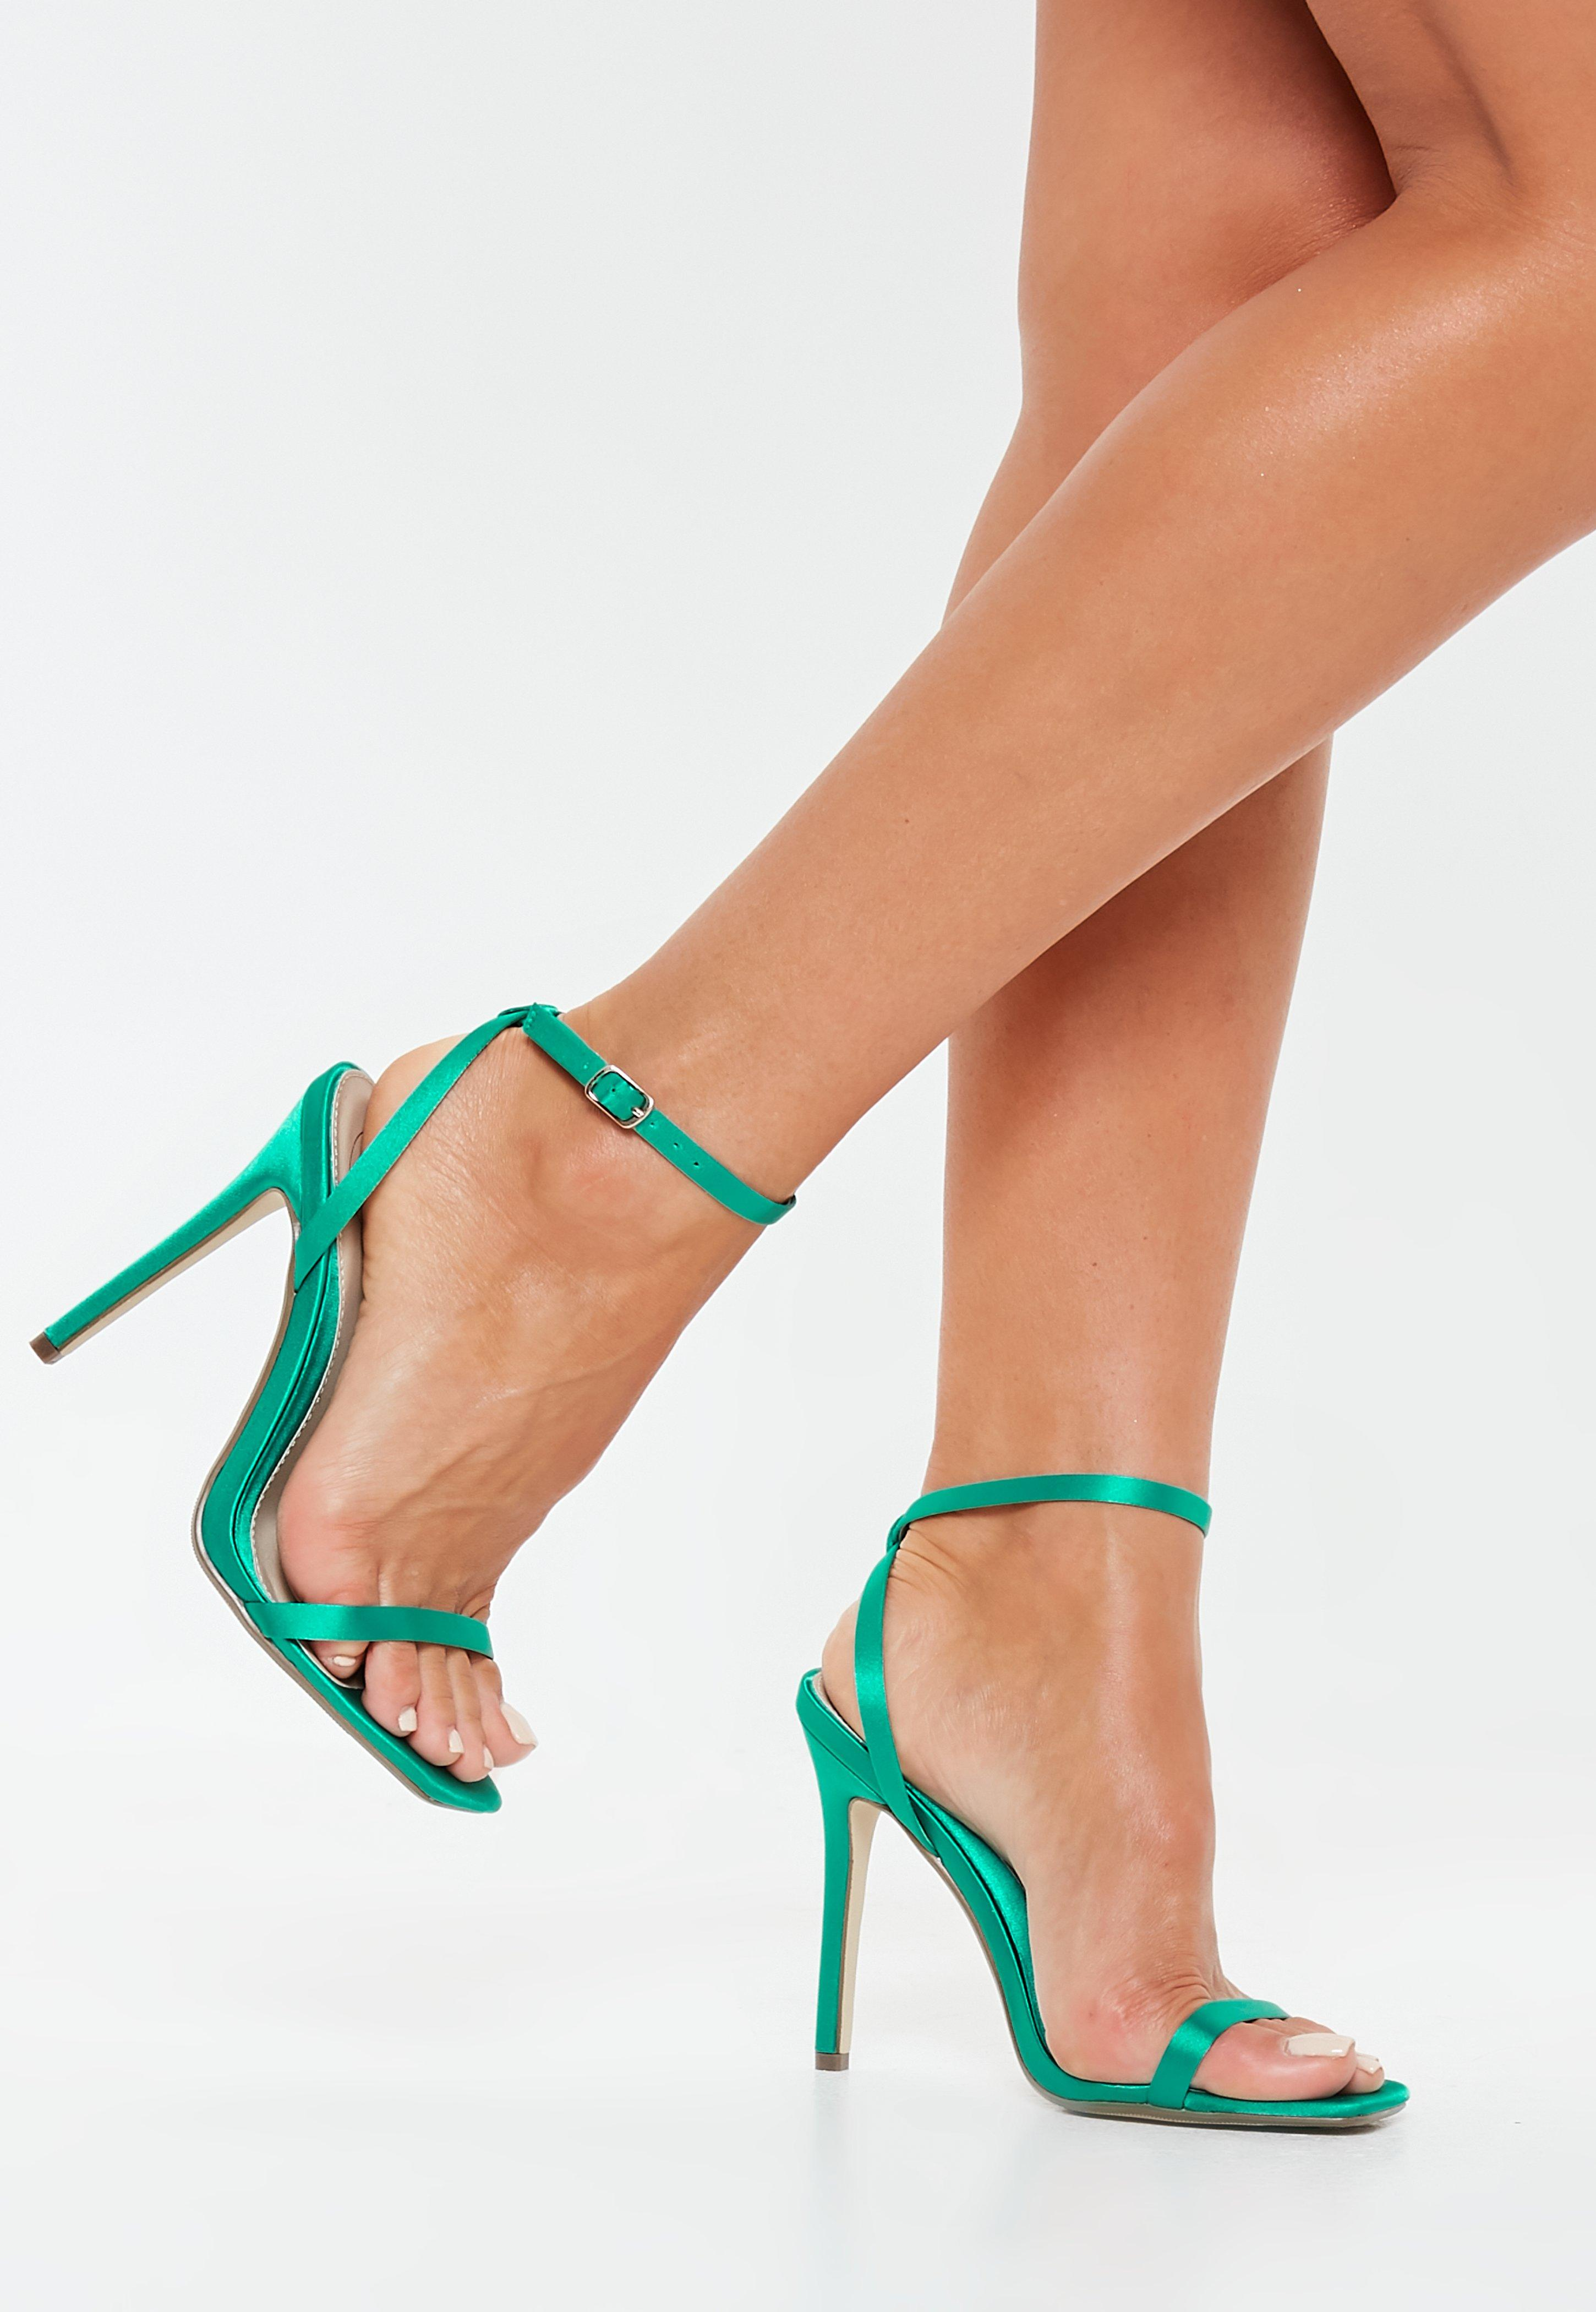 High Heels Stilettos Black White Nude Missguided Glamour Suede